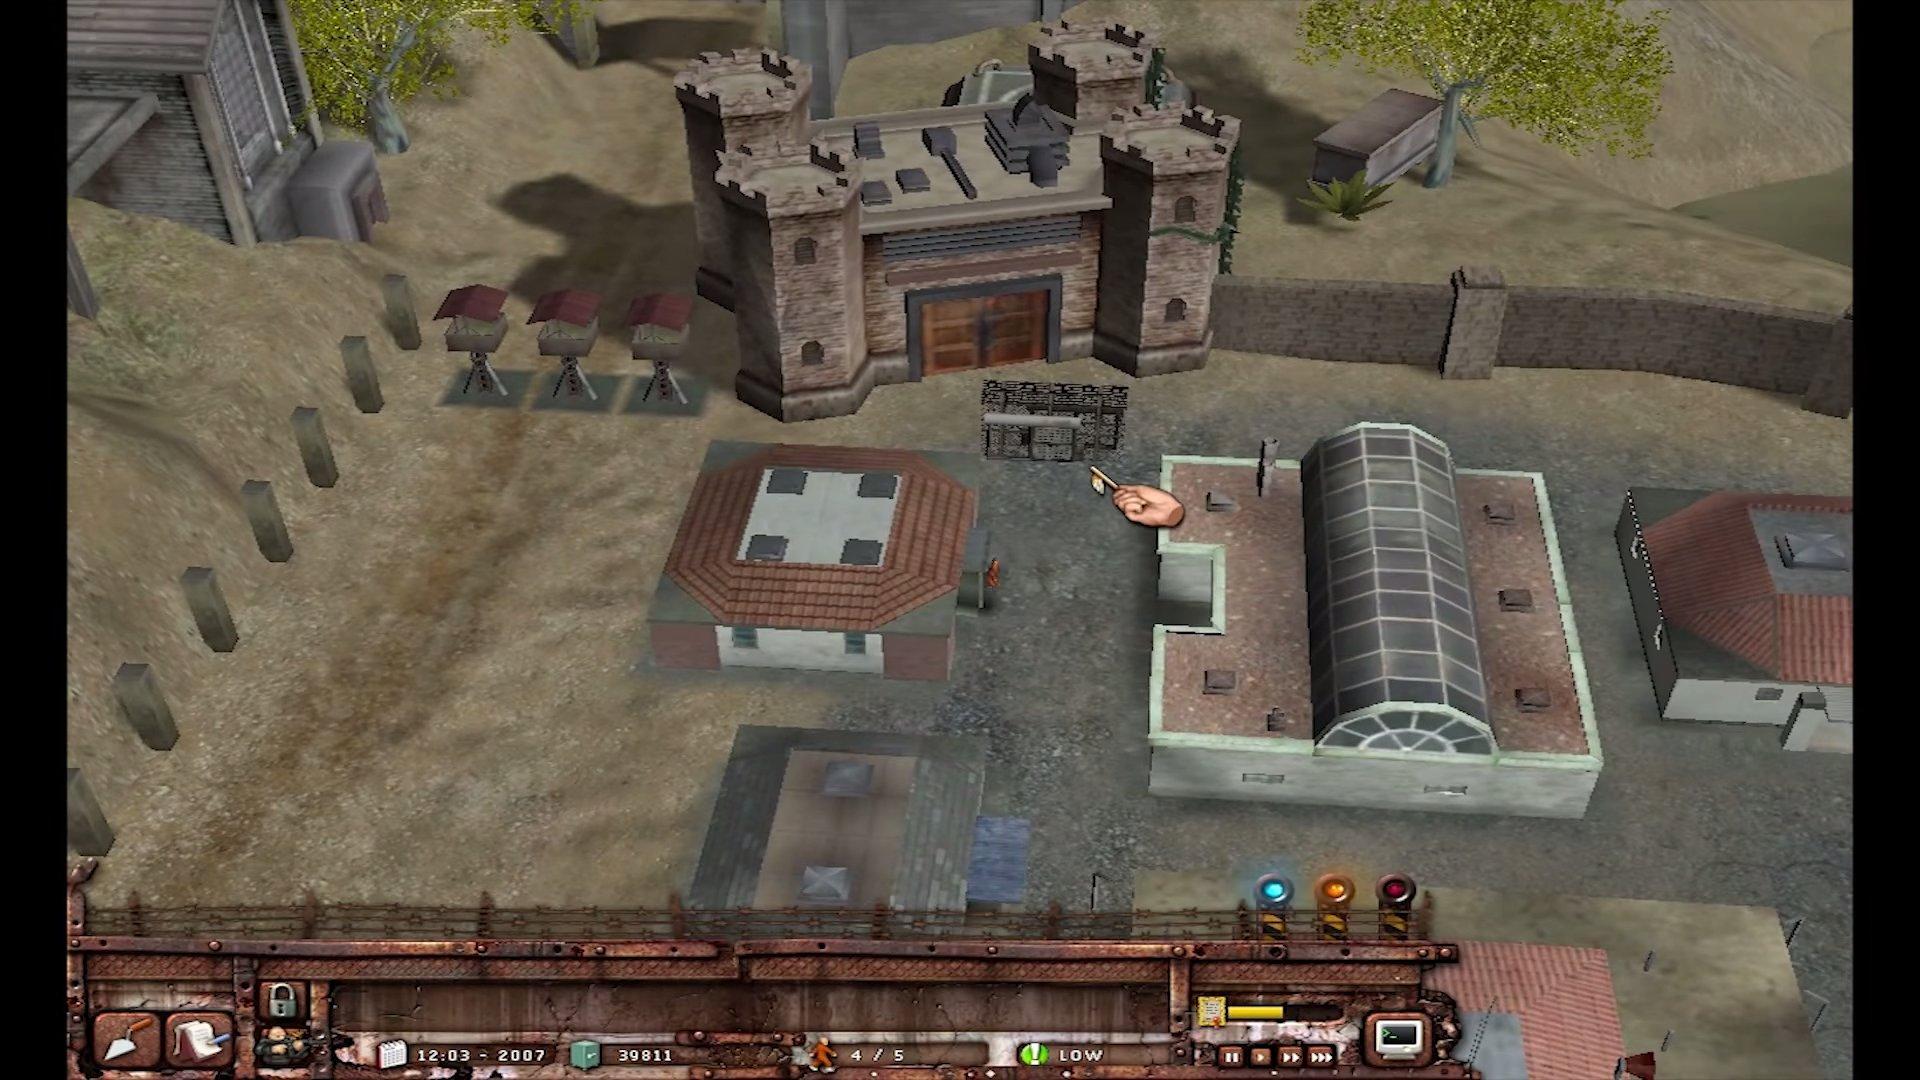 Prison tycoon: alcatraz full version game download pcgamefreetop.